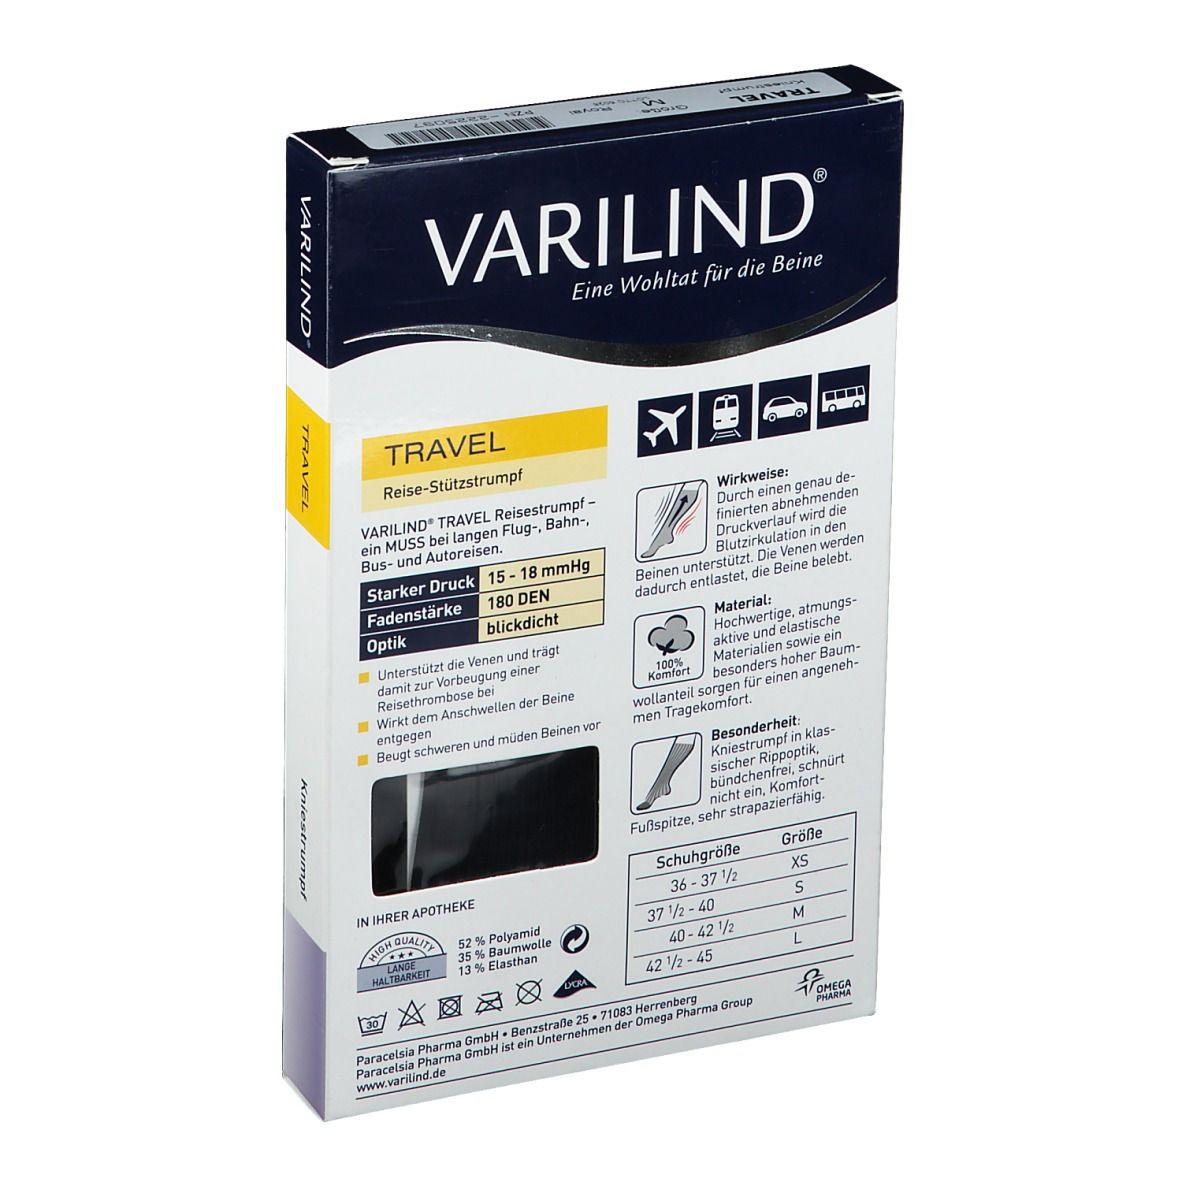 VARILIND® Travel Kniestrümpfe 180 DEN blau Gr. M (40-42,5)